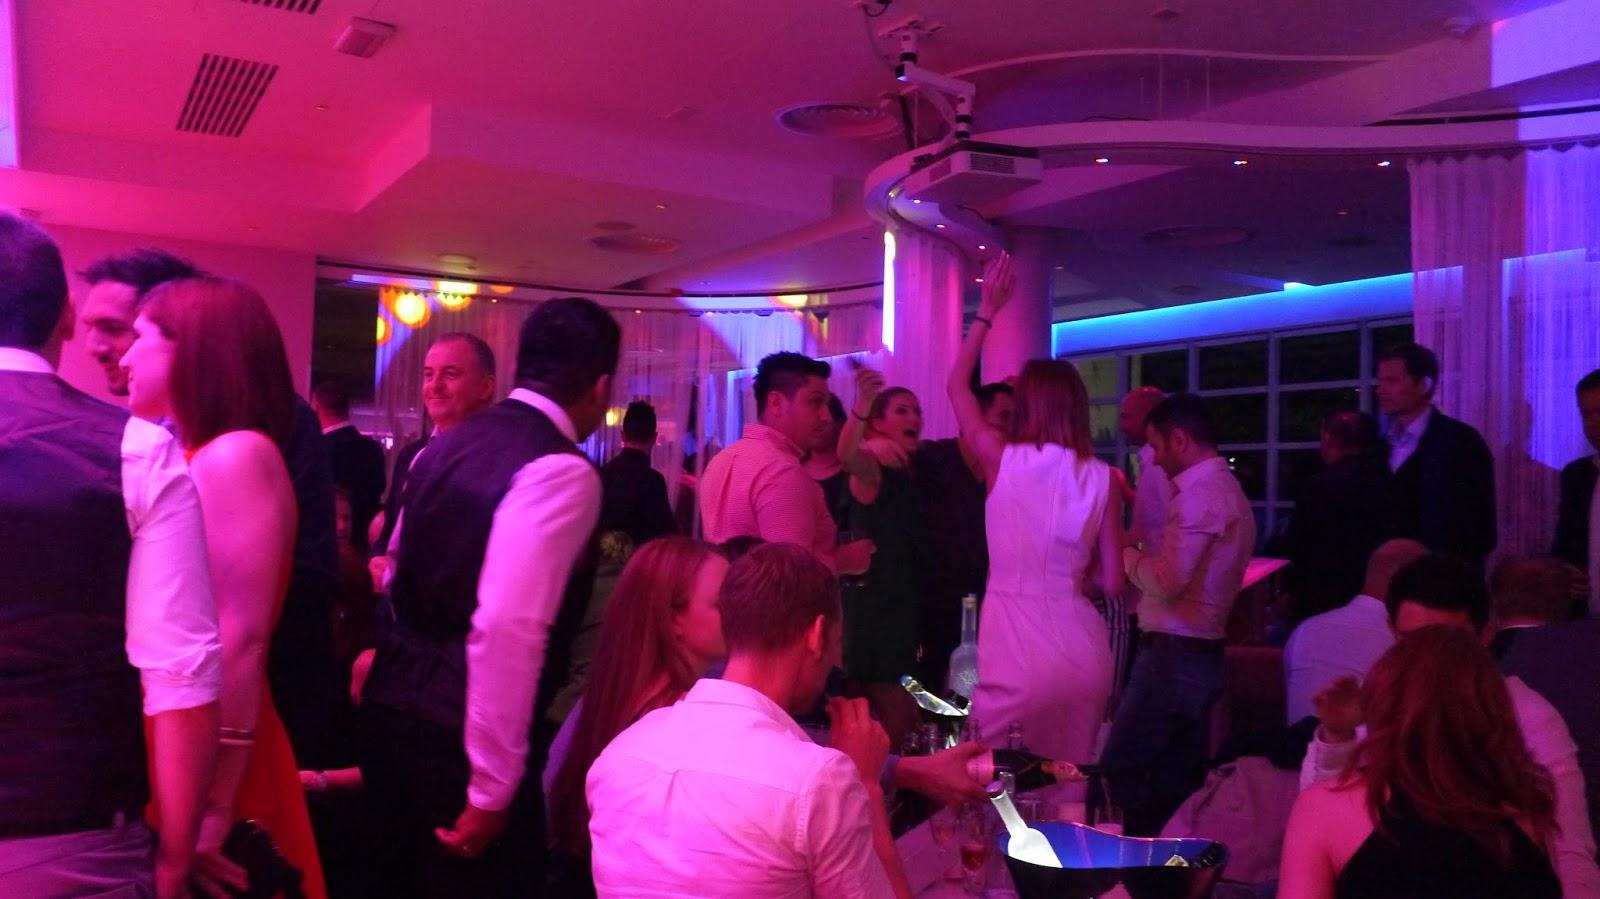 Roof Gardens Kensington VIP Room